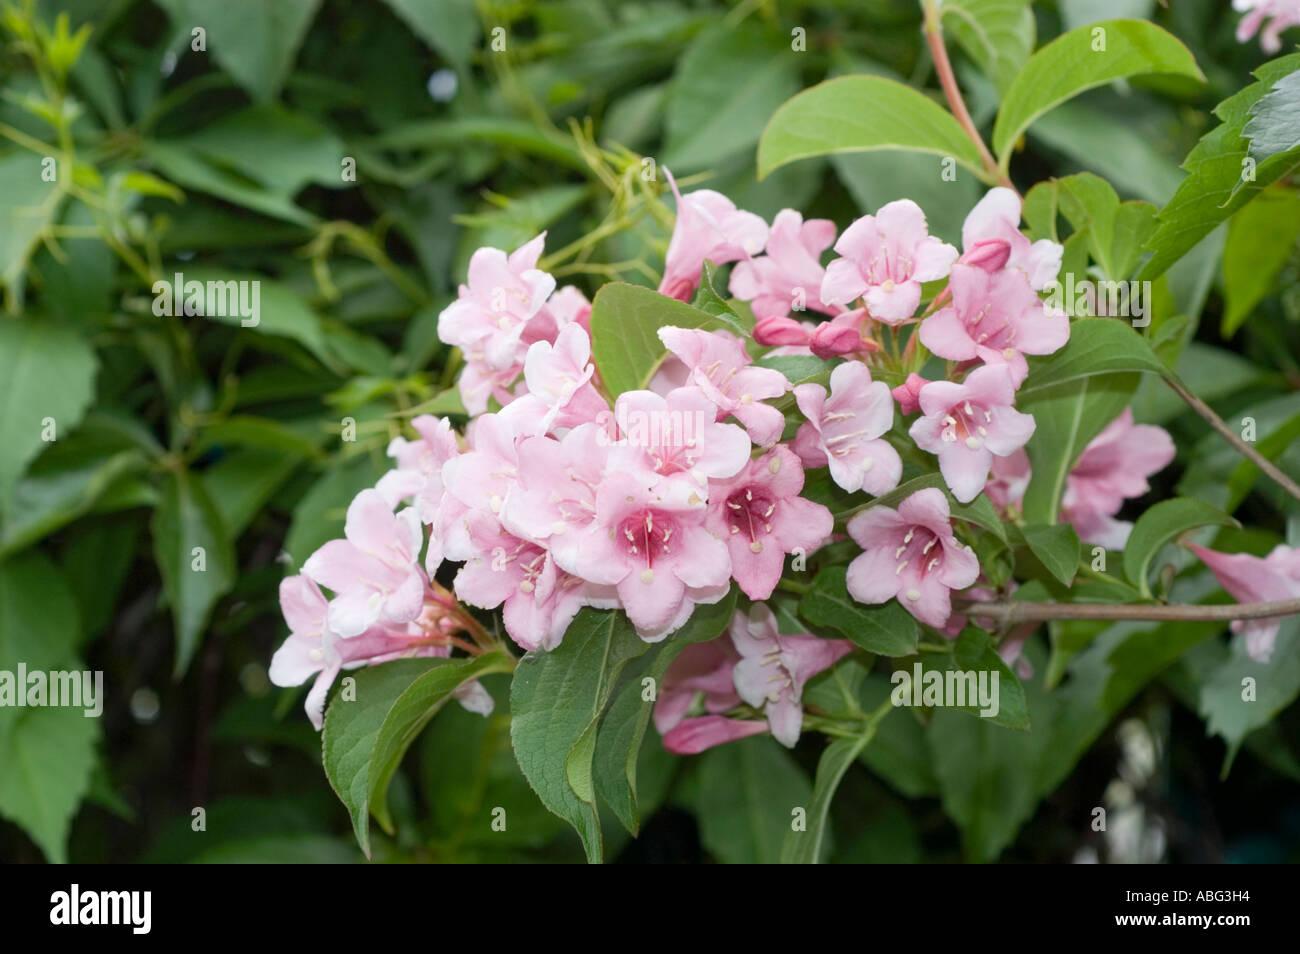 Pink Flowers On Green Bush Of Caprifoliaceae Weigela Splendid Stock